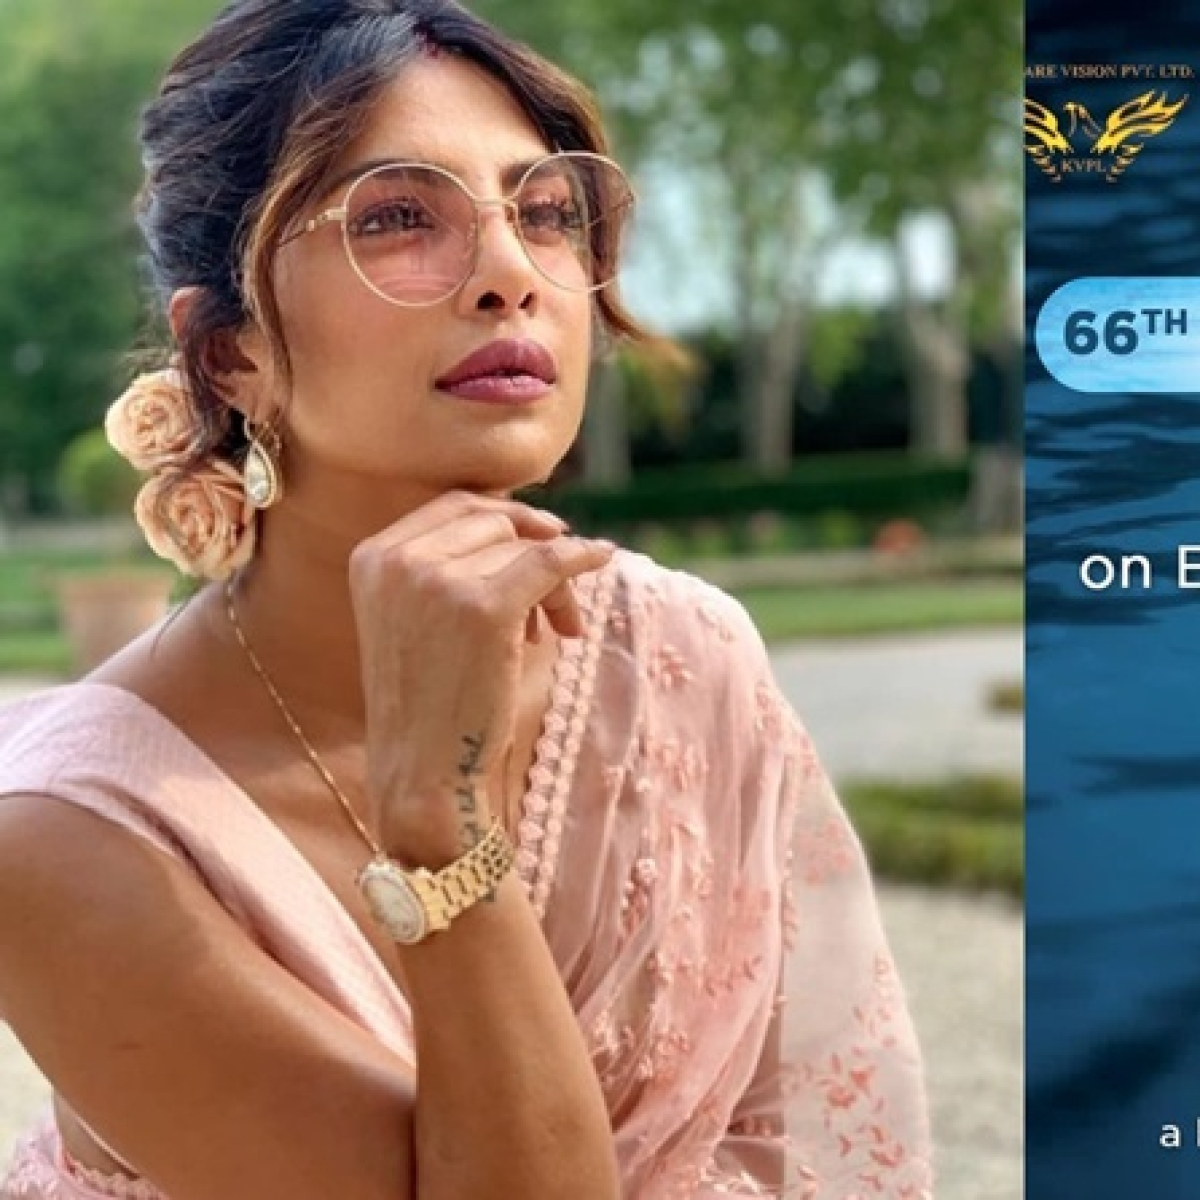 Priyanka Chopra gushes about 'Paani's National Award win, thanks team and mom Madhu Chopra